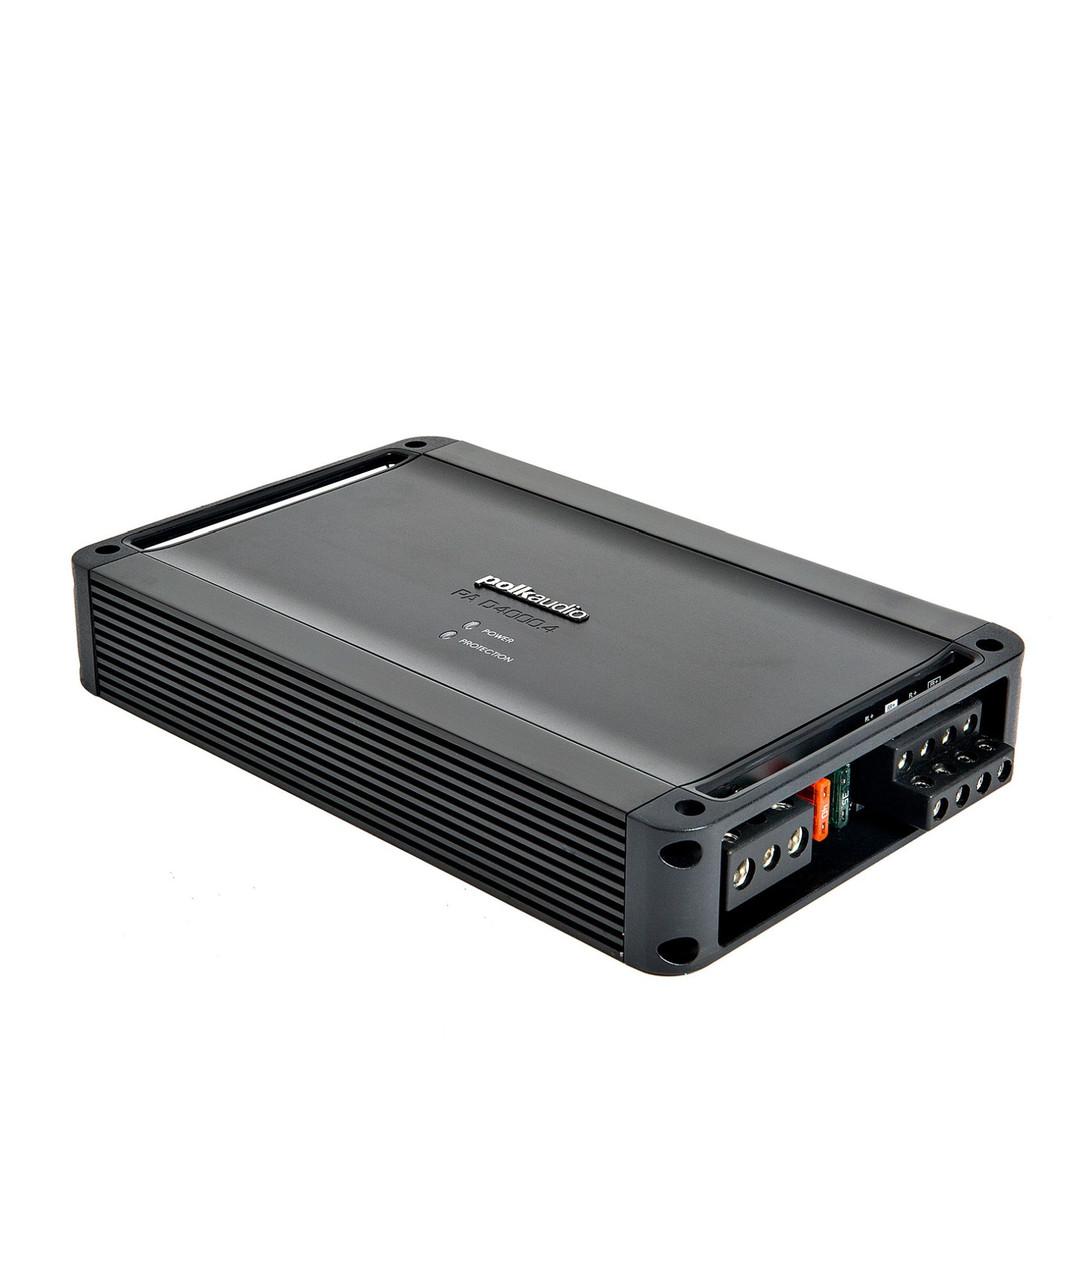 hight resolution of polk audio for dodge ram 94 2011 a pair of db652 6 5 s a pair of db692 6x9 s pa d4000 4 amp wire kit creative audio